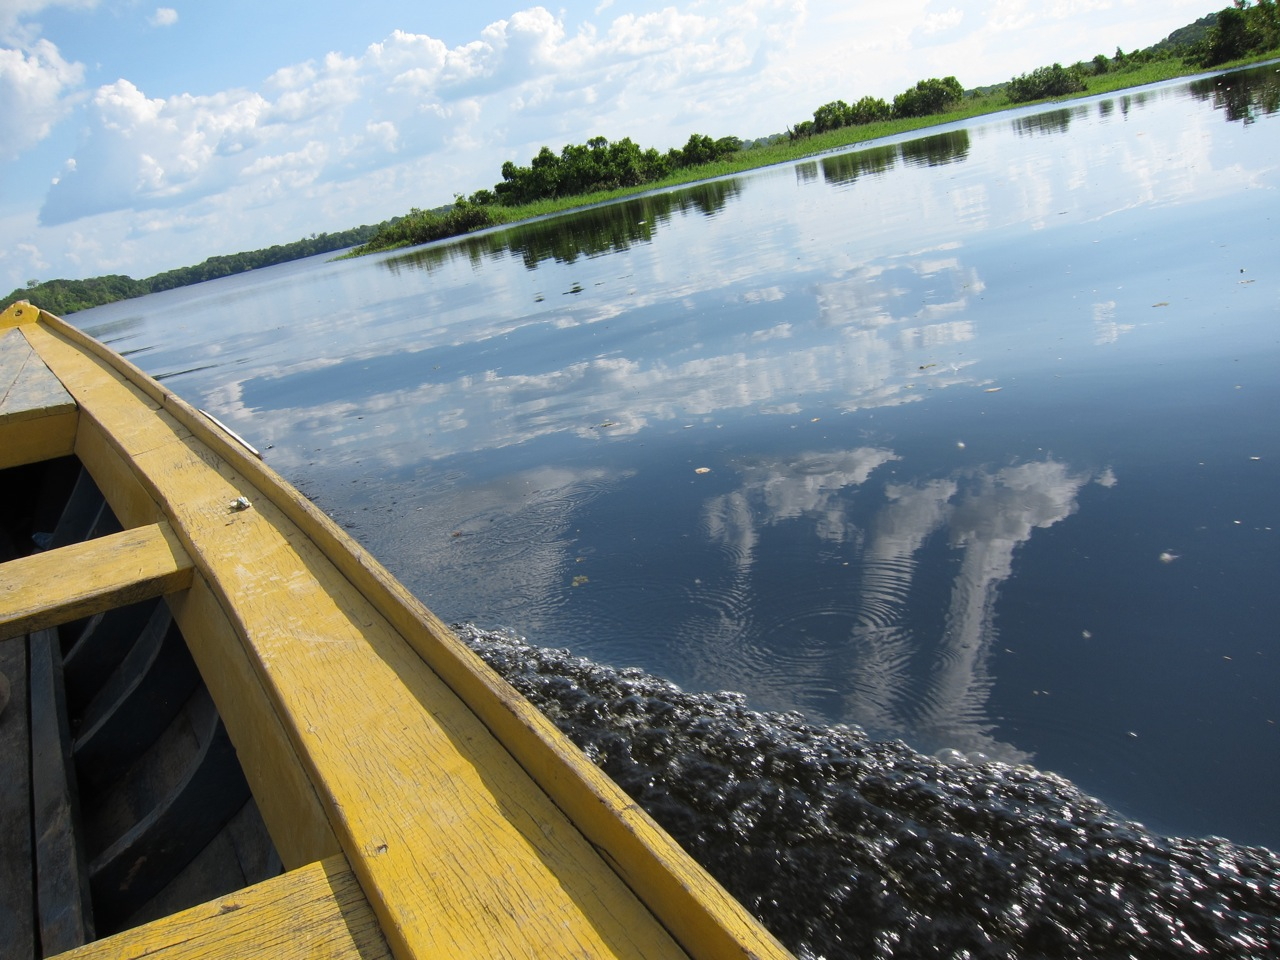 Amazon: River of life